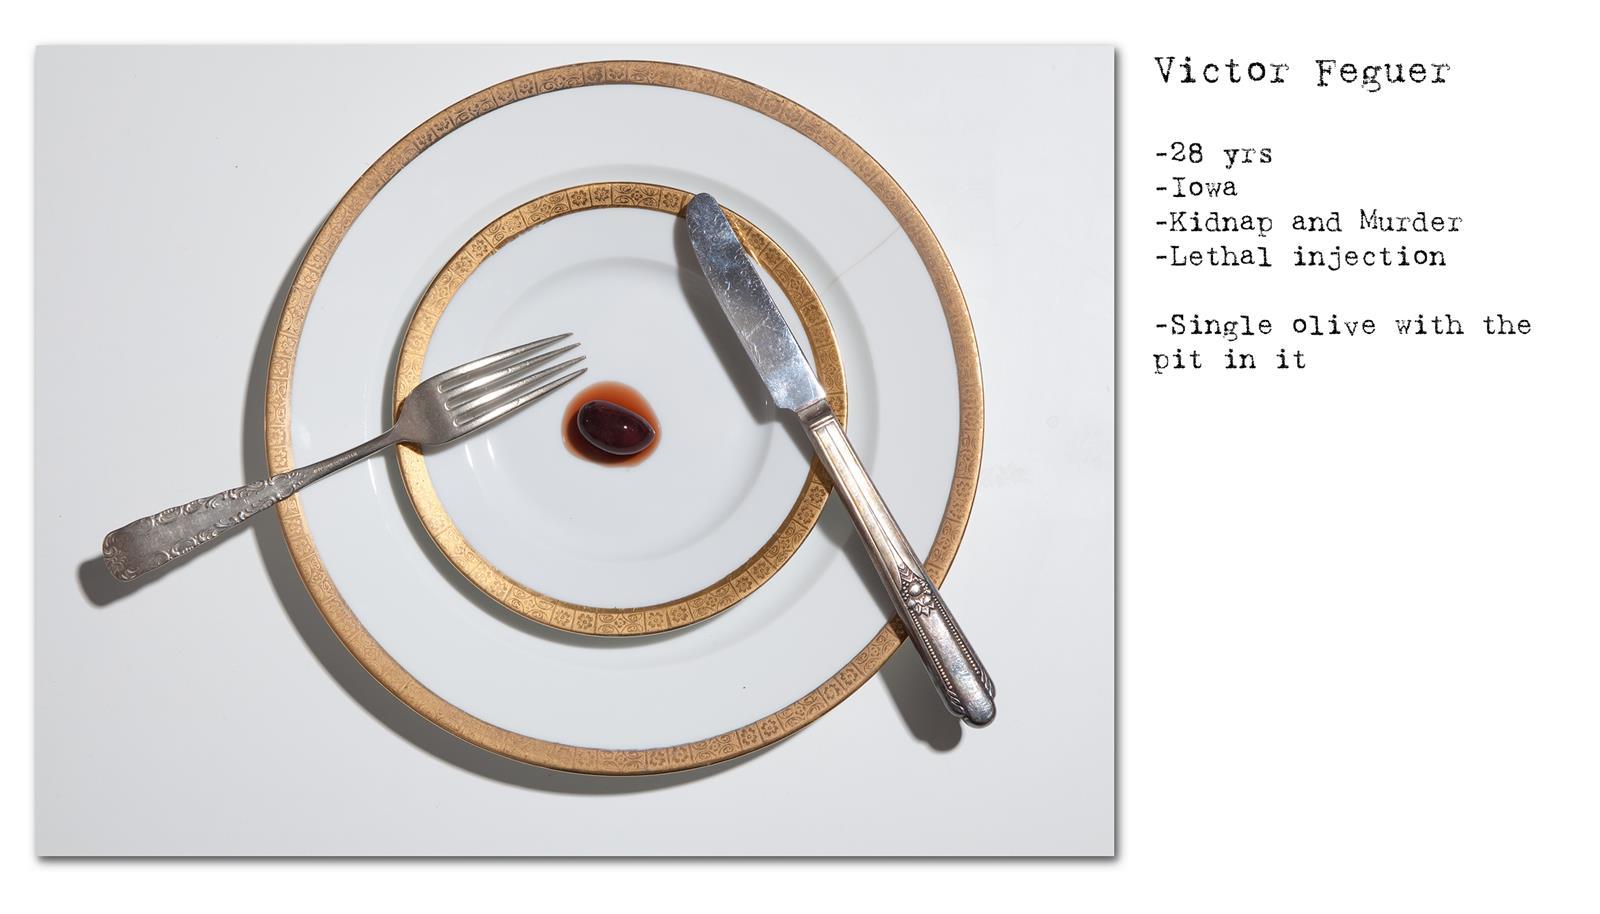 Death Row Prisoner's Last Meal (3)